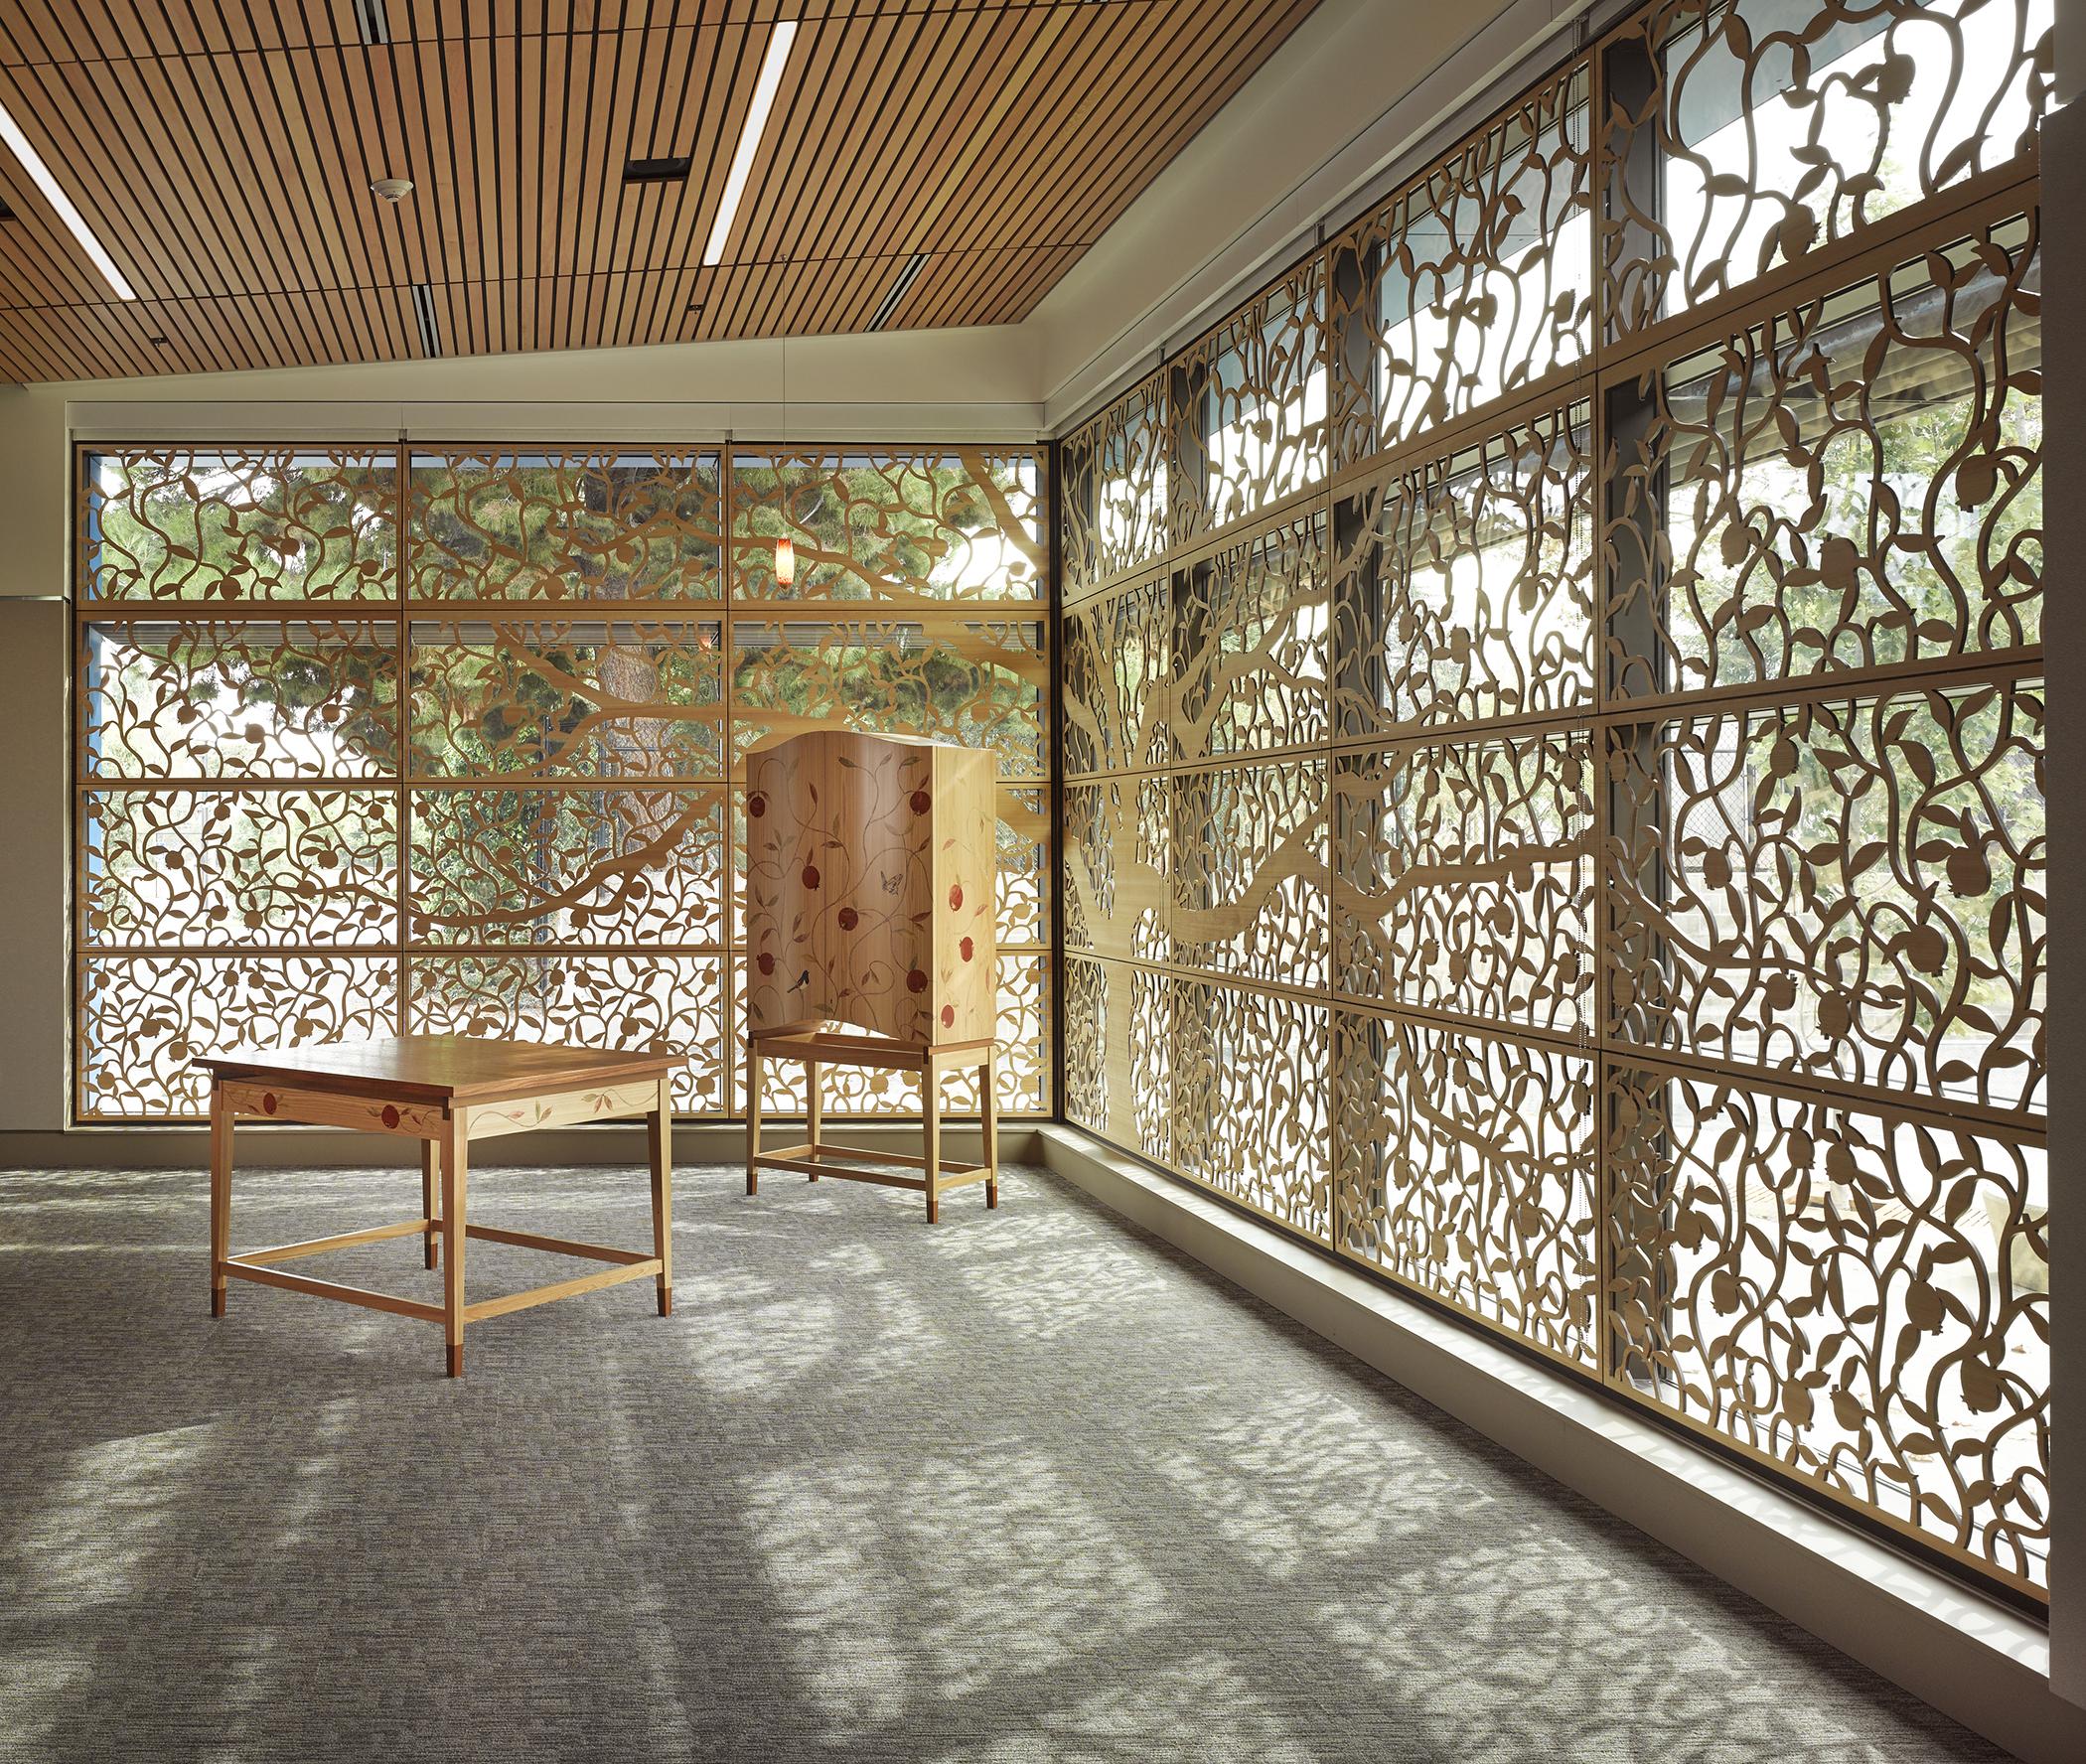 Gideon Hausner School, Palo Alto, CA  - Studio Bondy Architecture   Custom tree design, Window panels